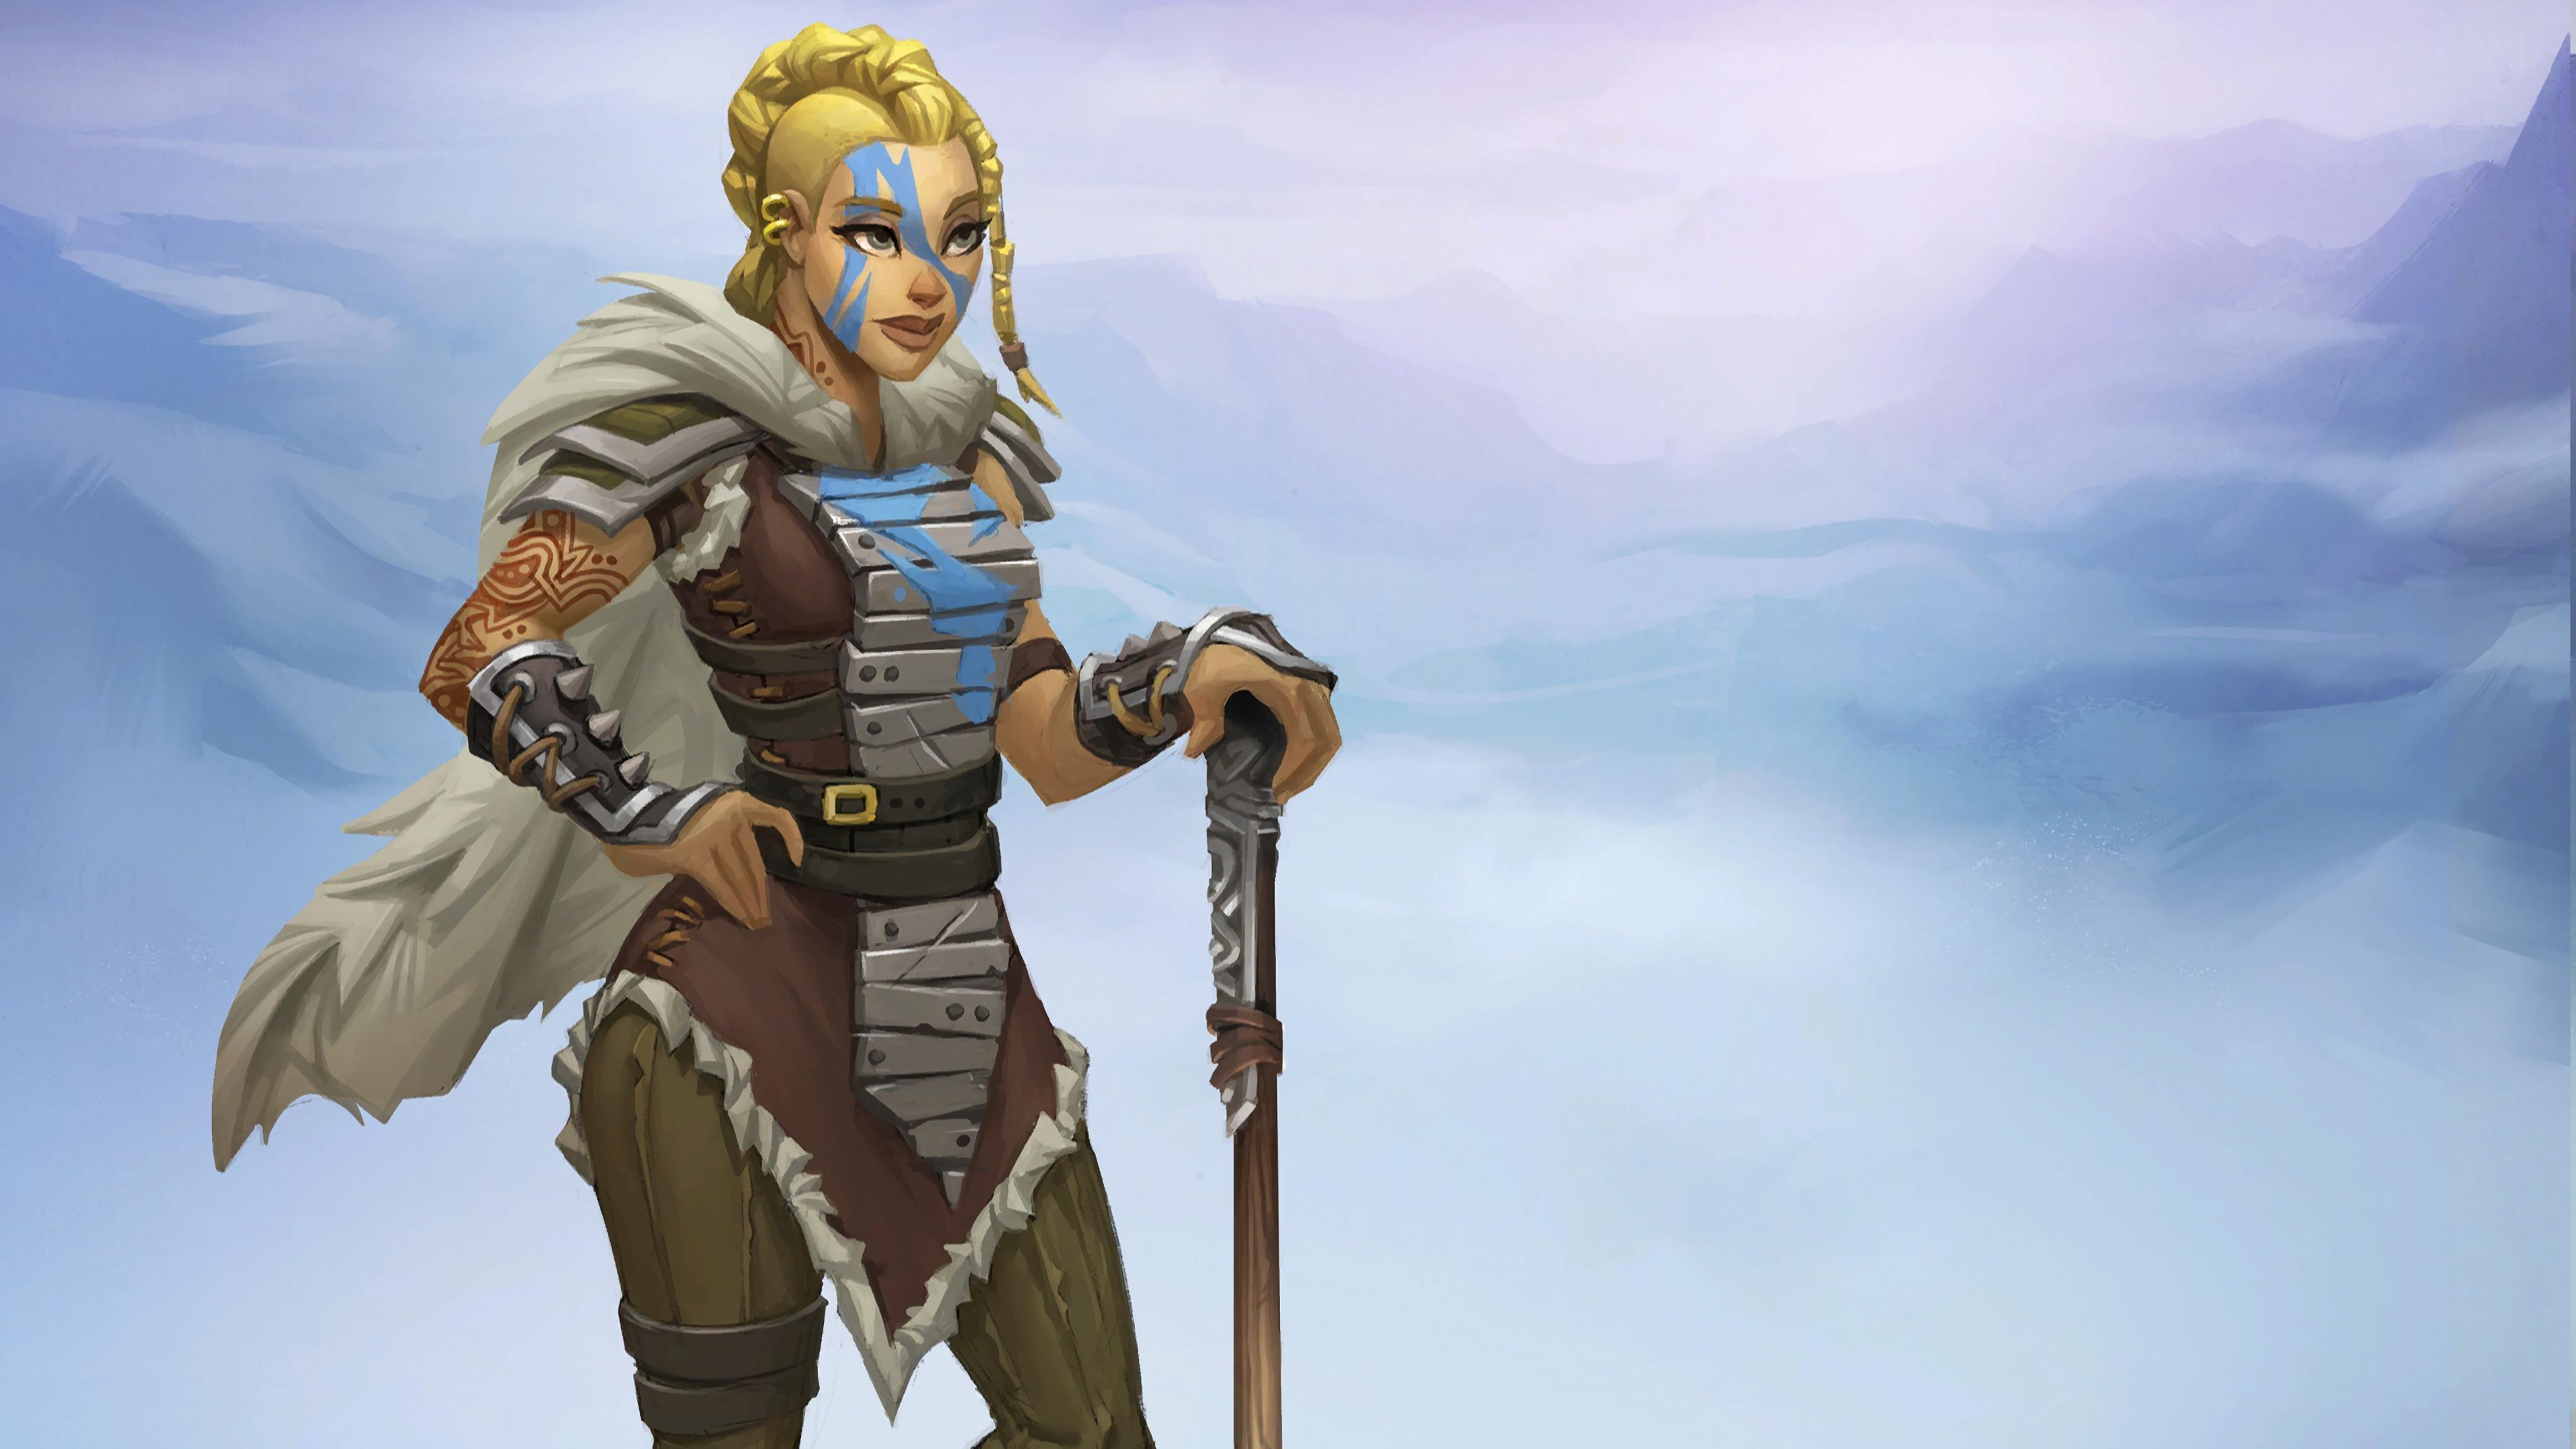 Huntress Fortnite Battle Royale Loading Screen 4K 18116 3840x2160